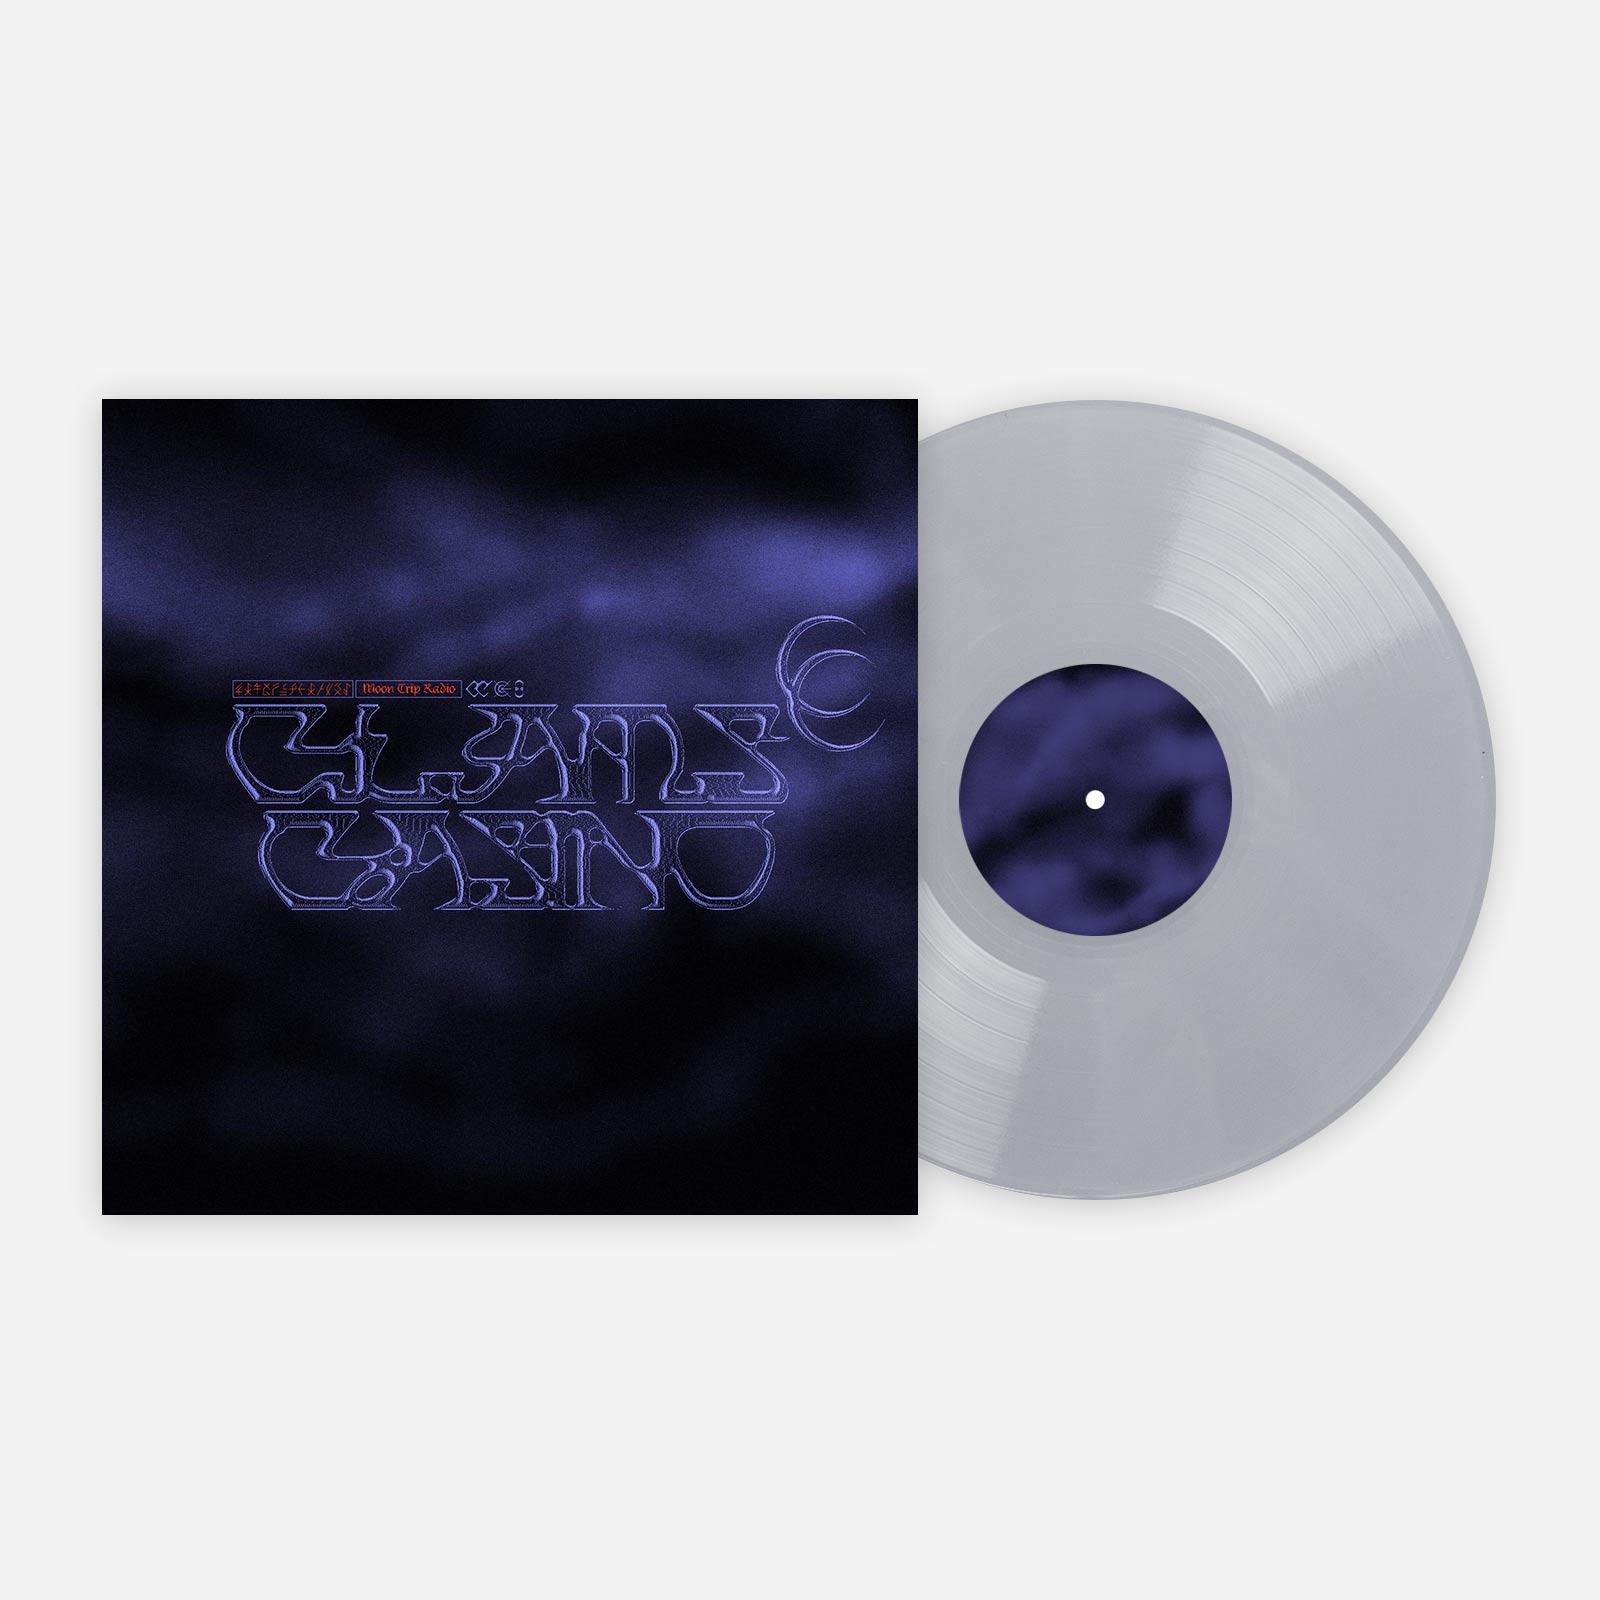 Moon Trip Radio Vinyl - VMP Edition